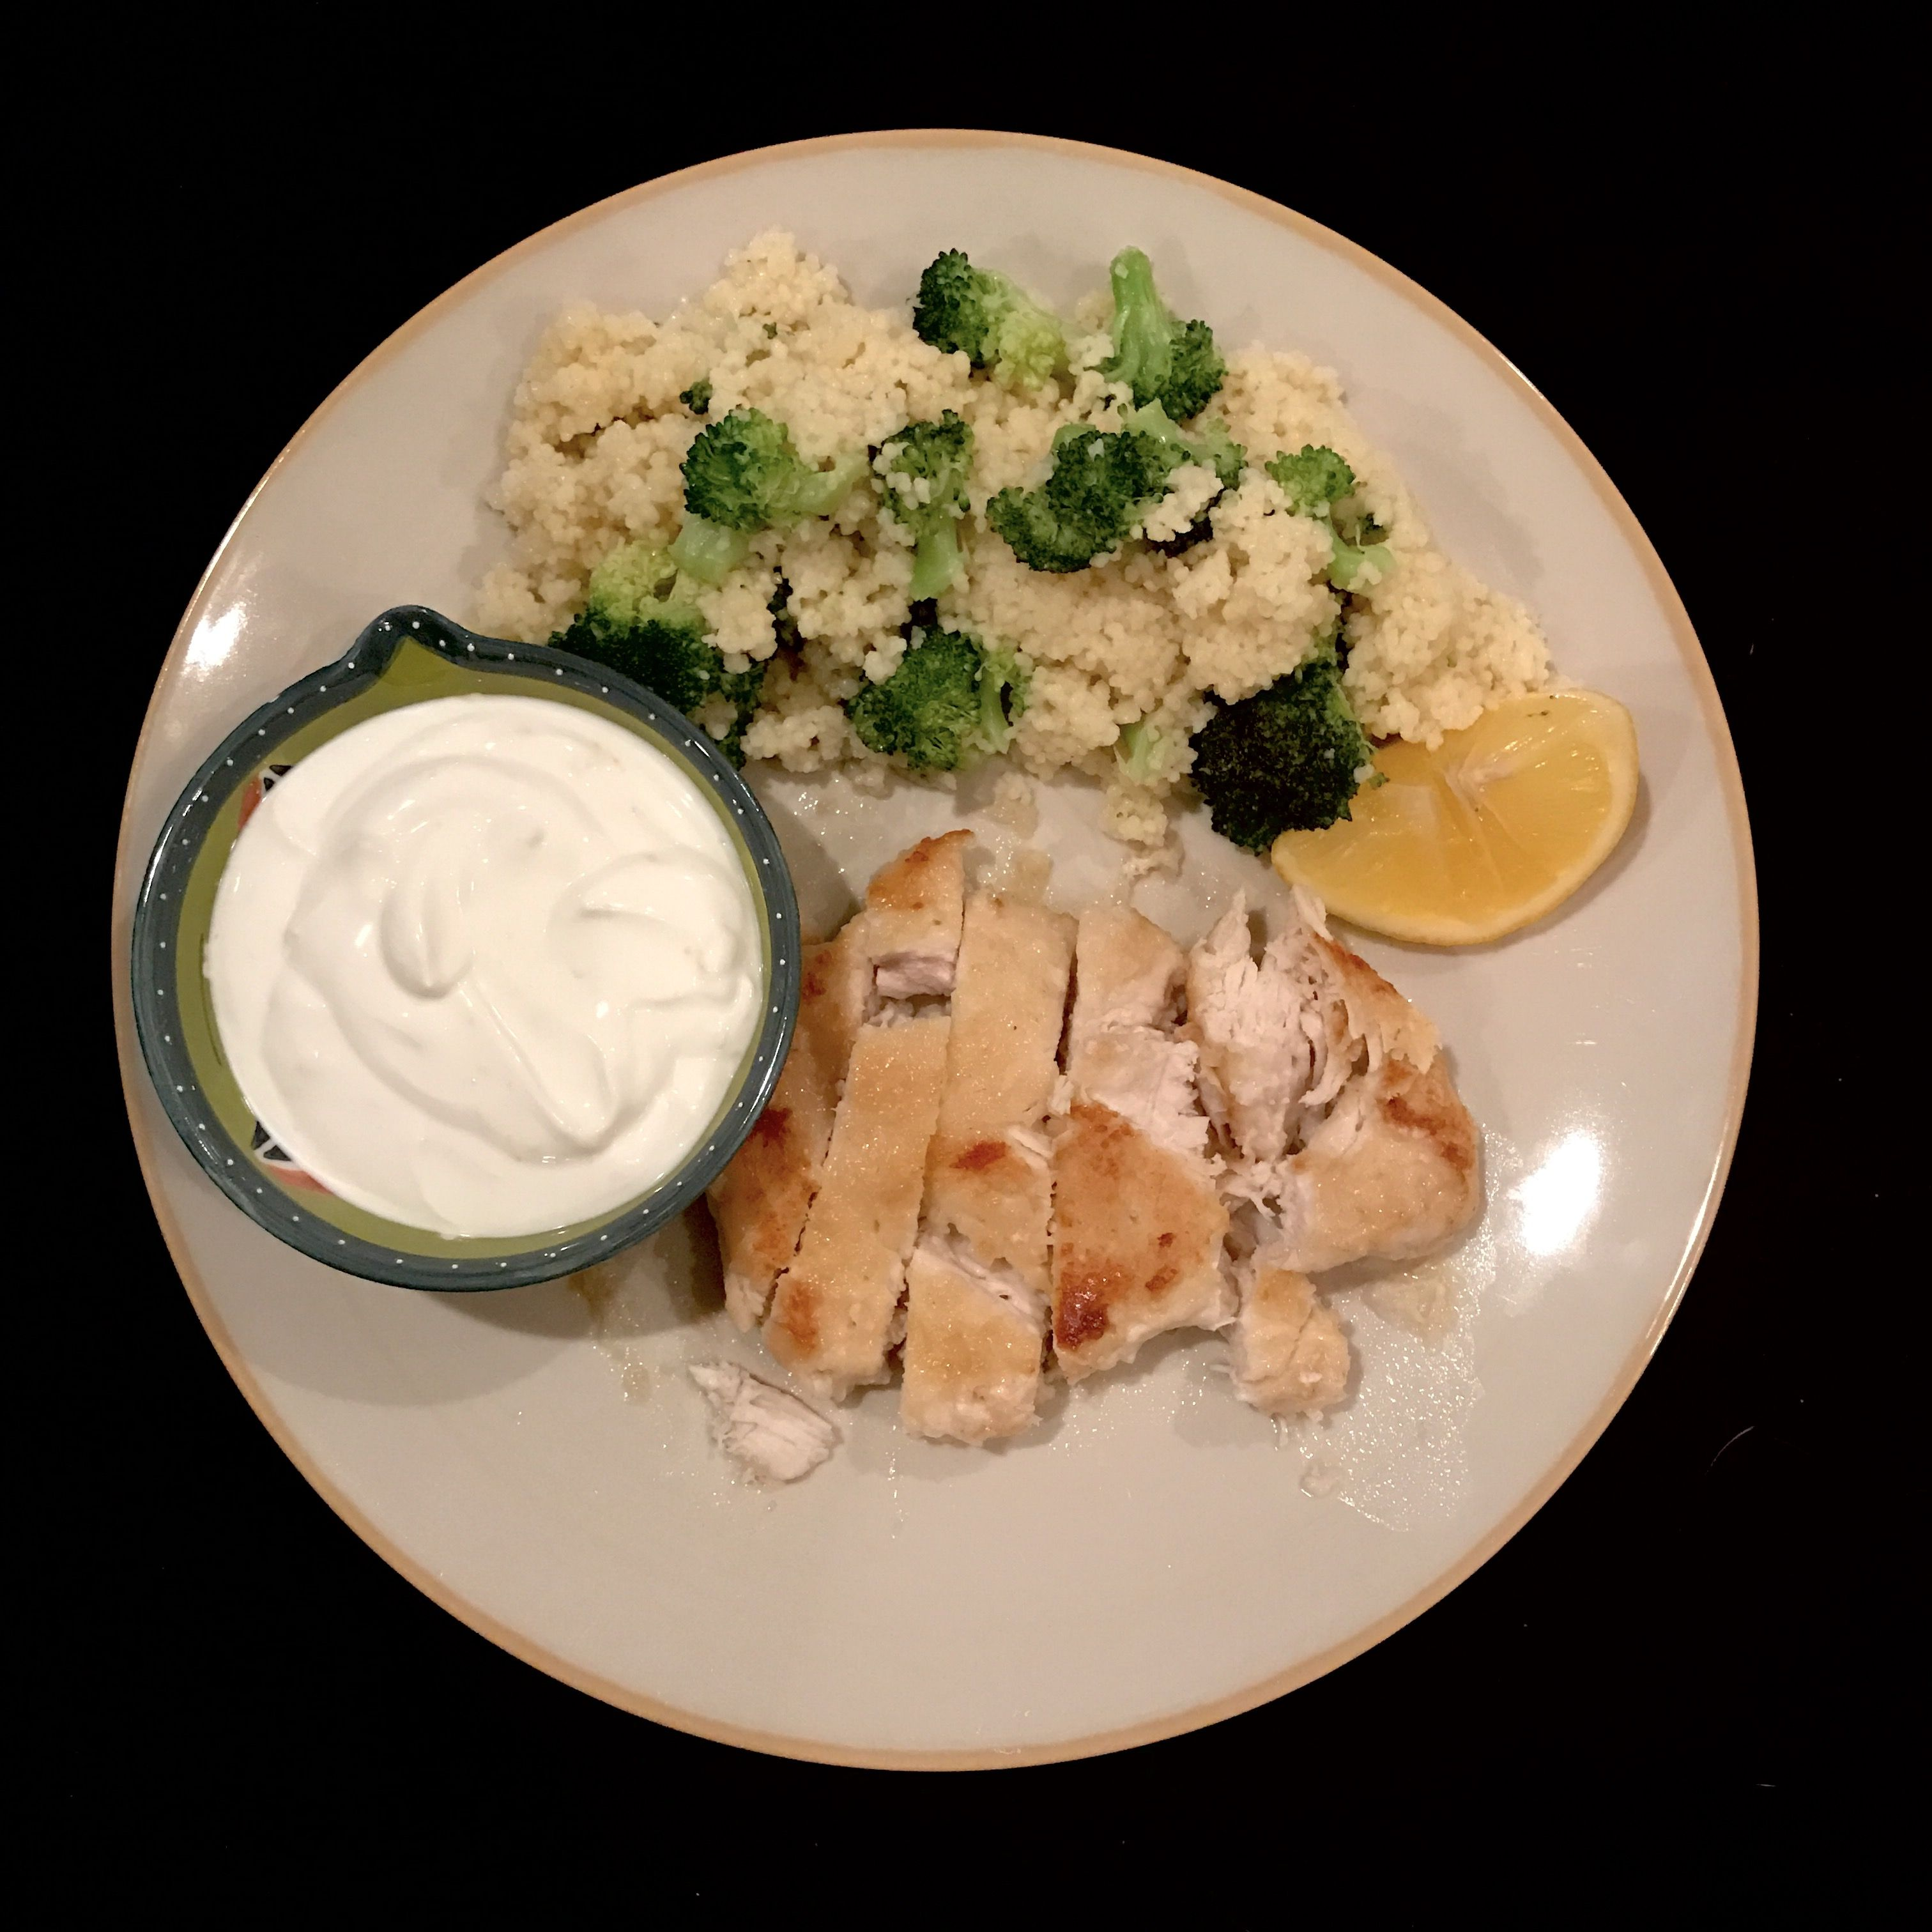 Blue apron yogurt sauce - Seared Chicken Couscous With Broccoli And Lemon Yogurt Sauce Blueapron